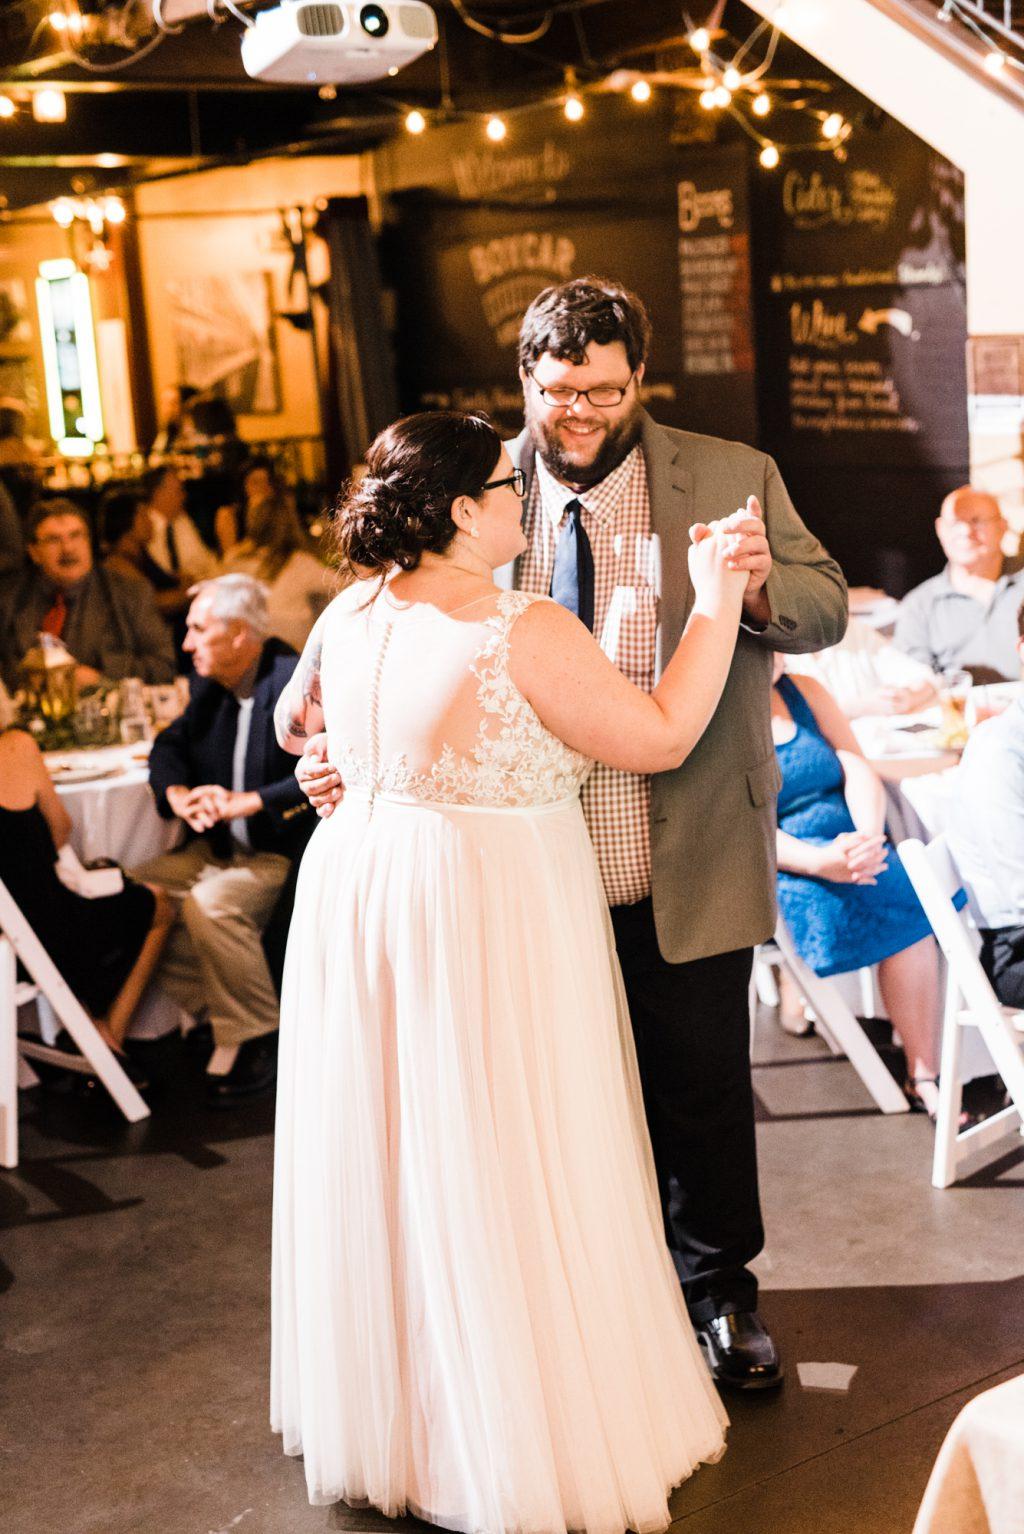 haley-richter-photo-west-chester-summer-wedding-boxcar-brewery-174